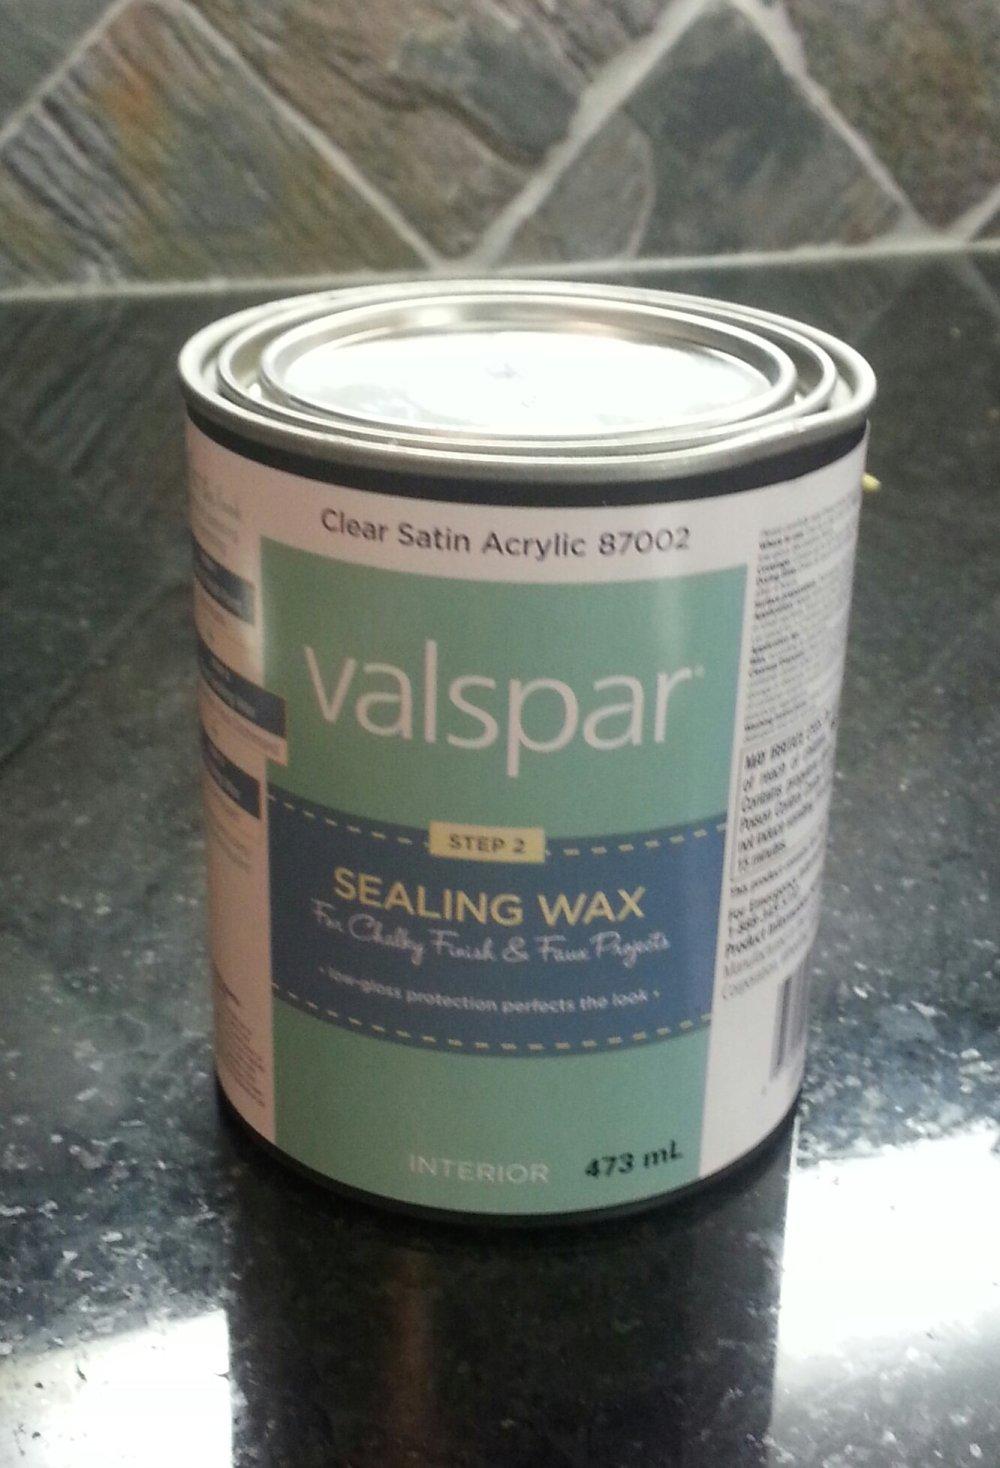 valspar sealing wax